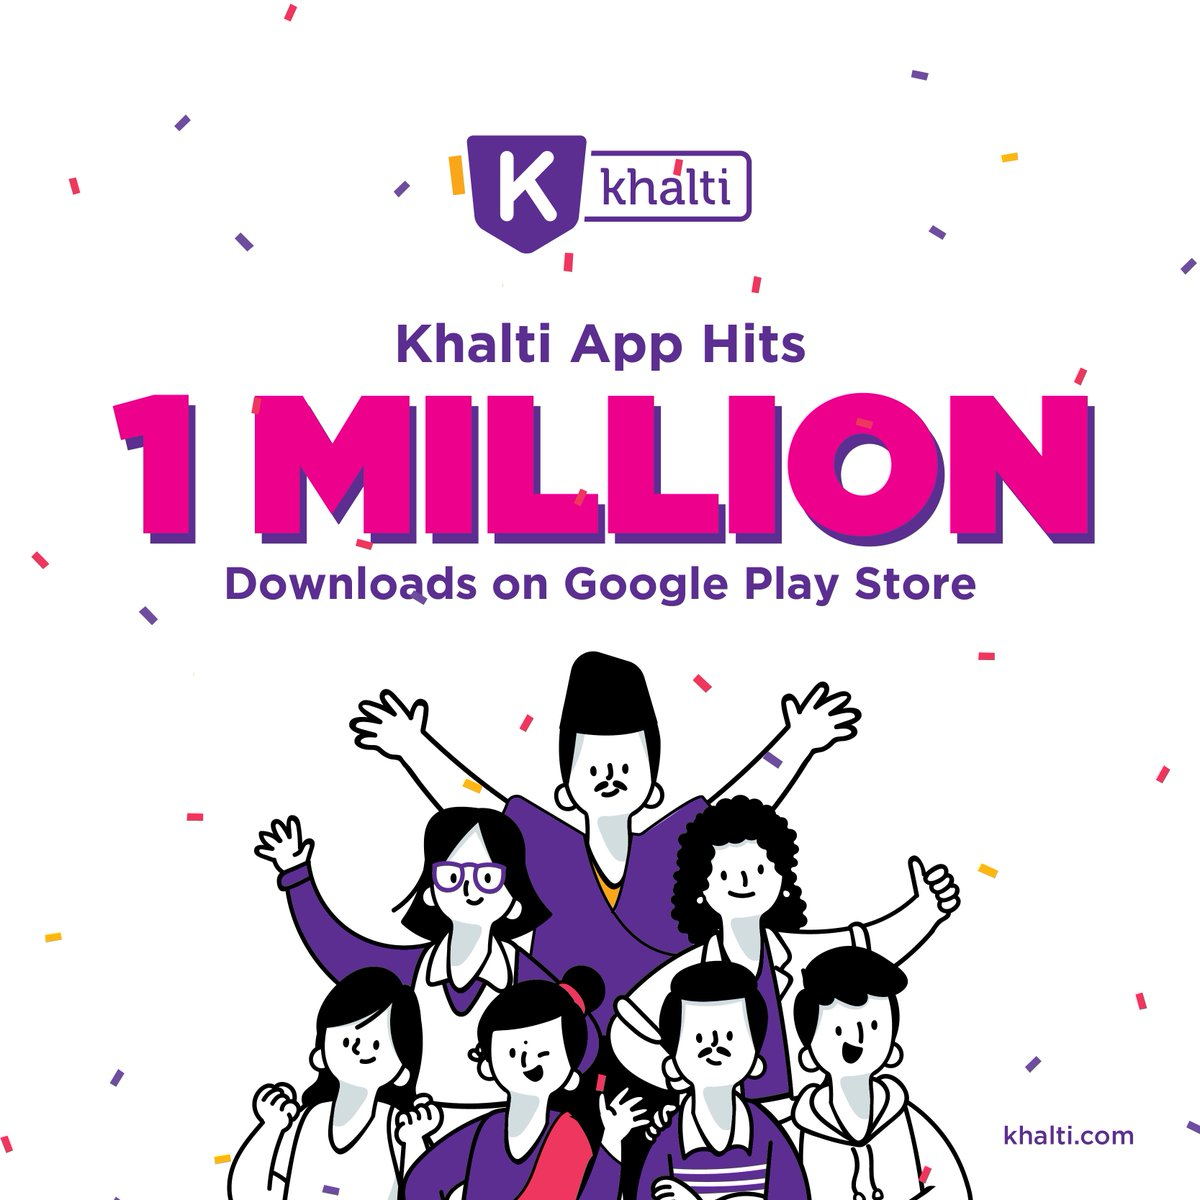 khalti one million downloads